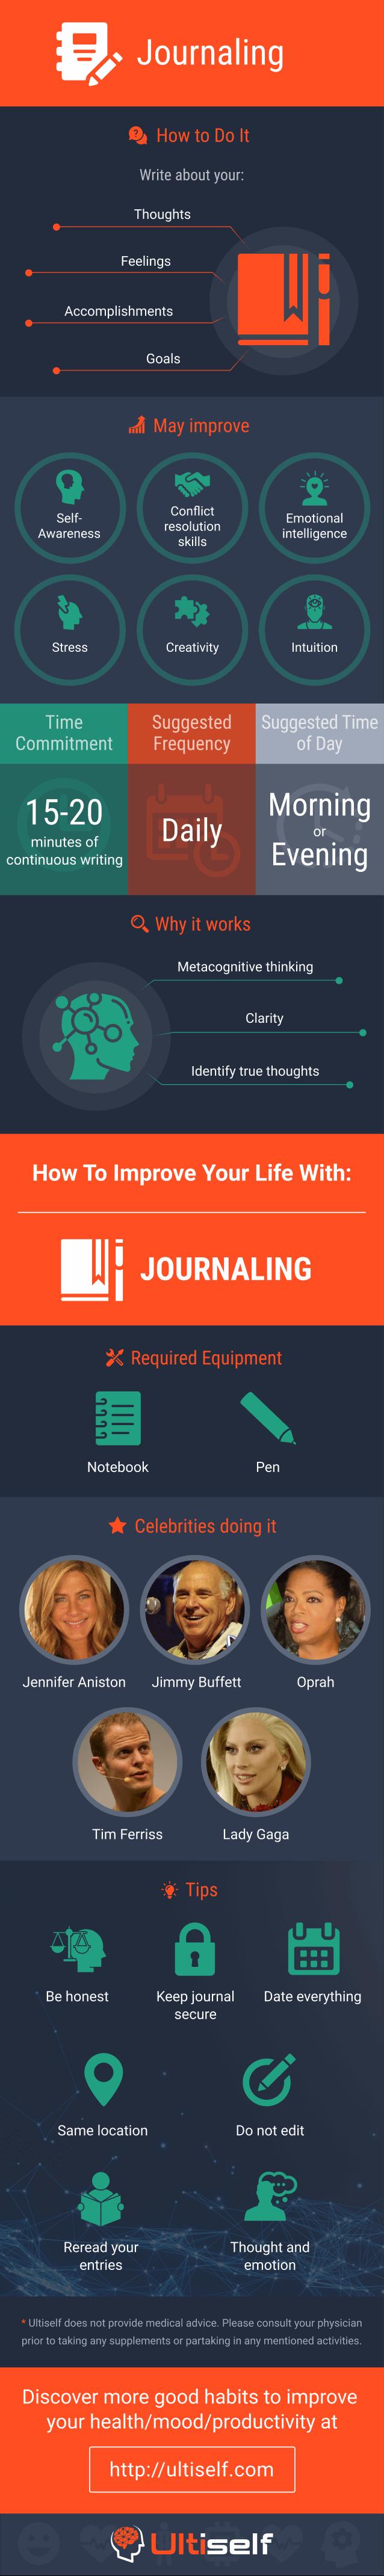 Journaling infographic